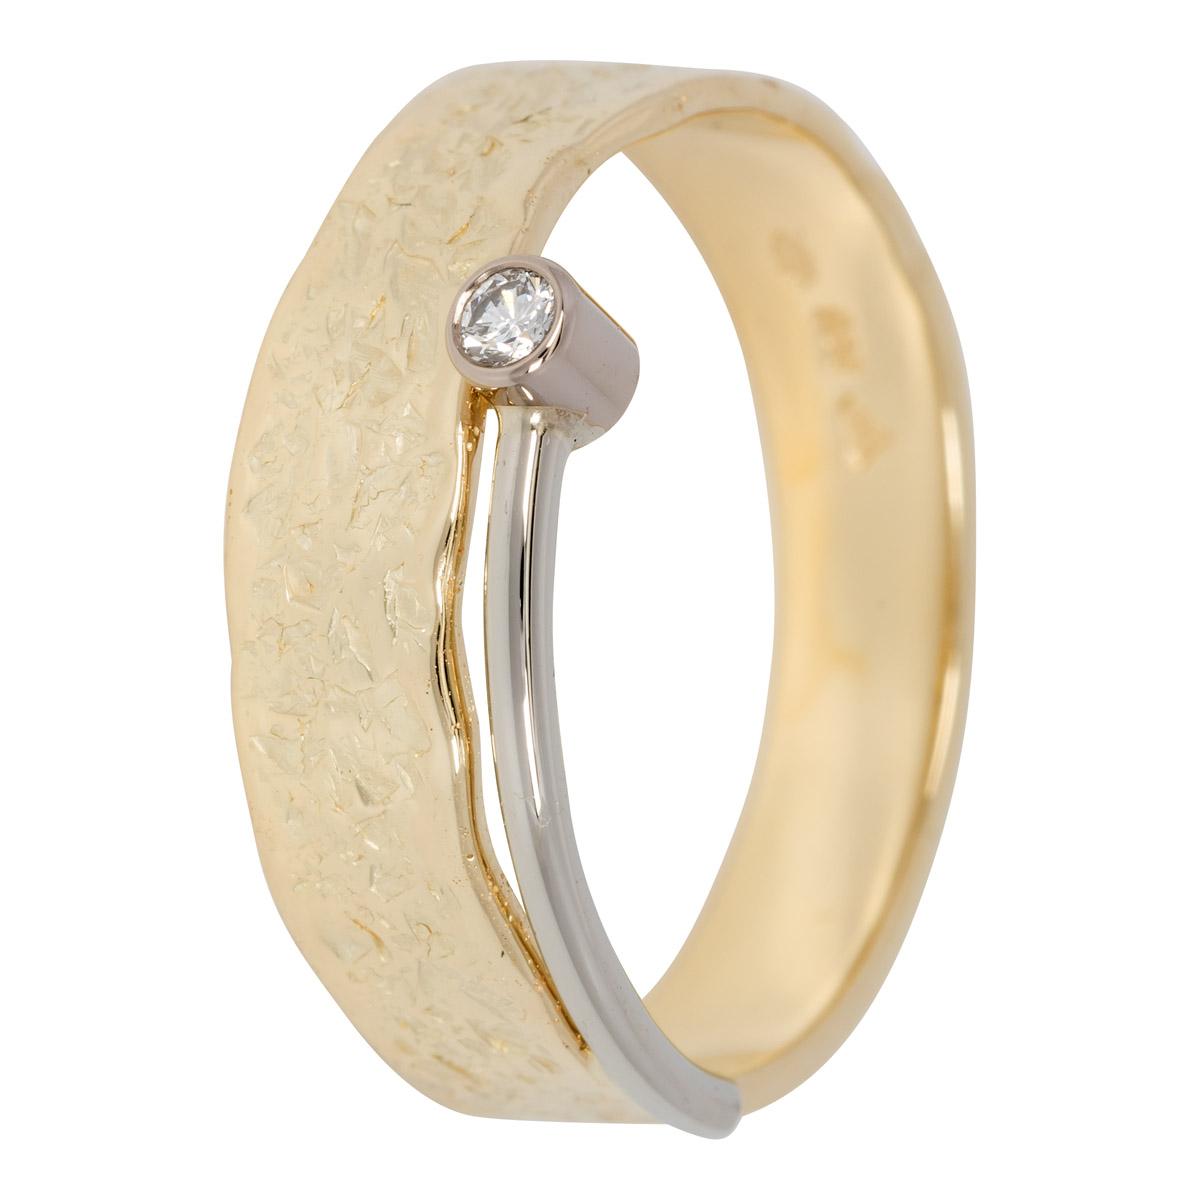 Geel-witgouden ring met briljant